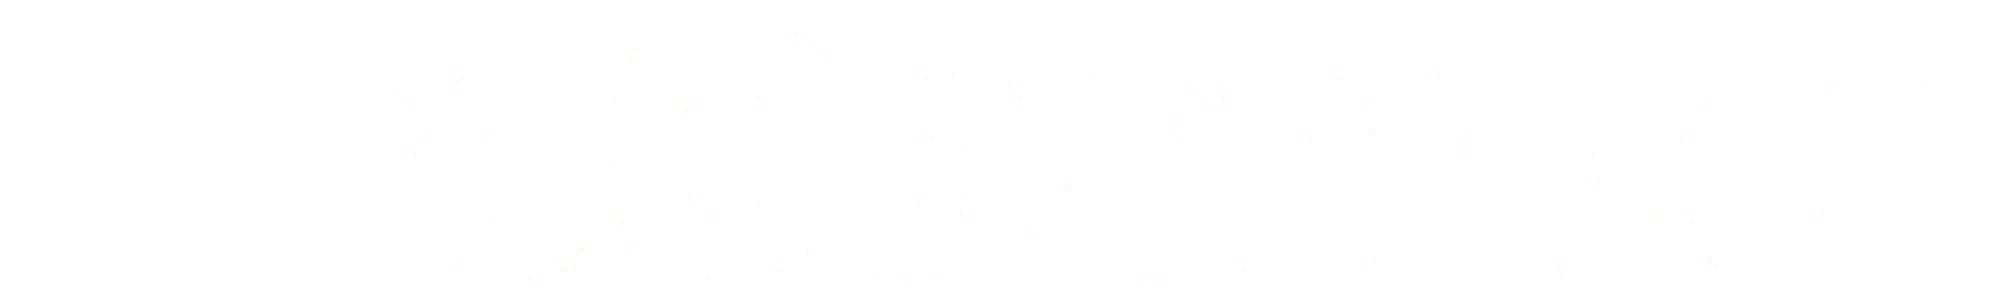 The_Observer_logo.png